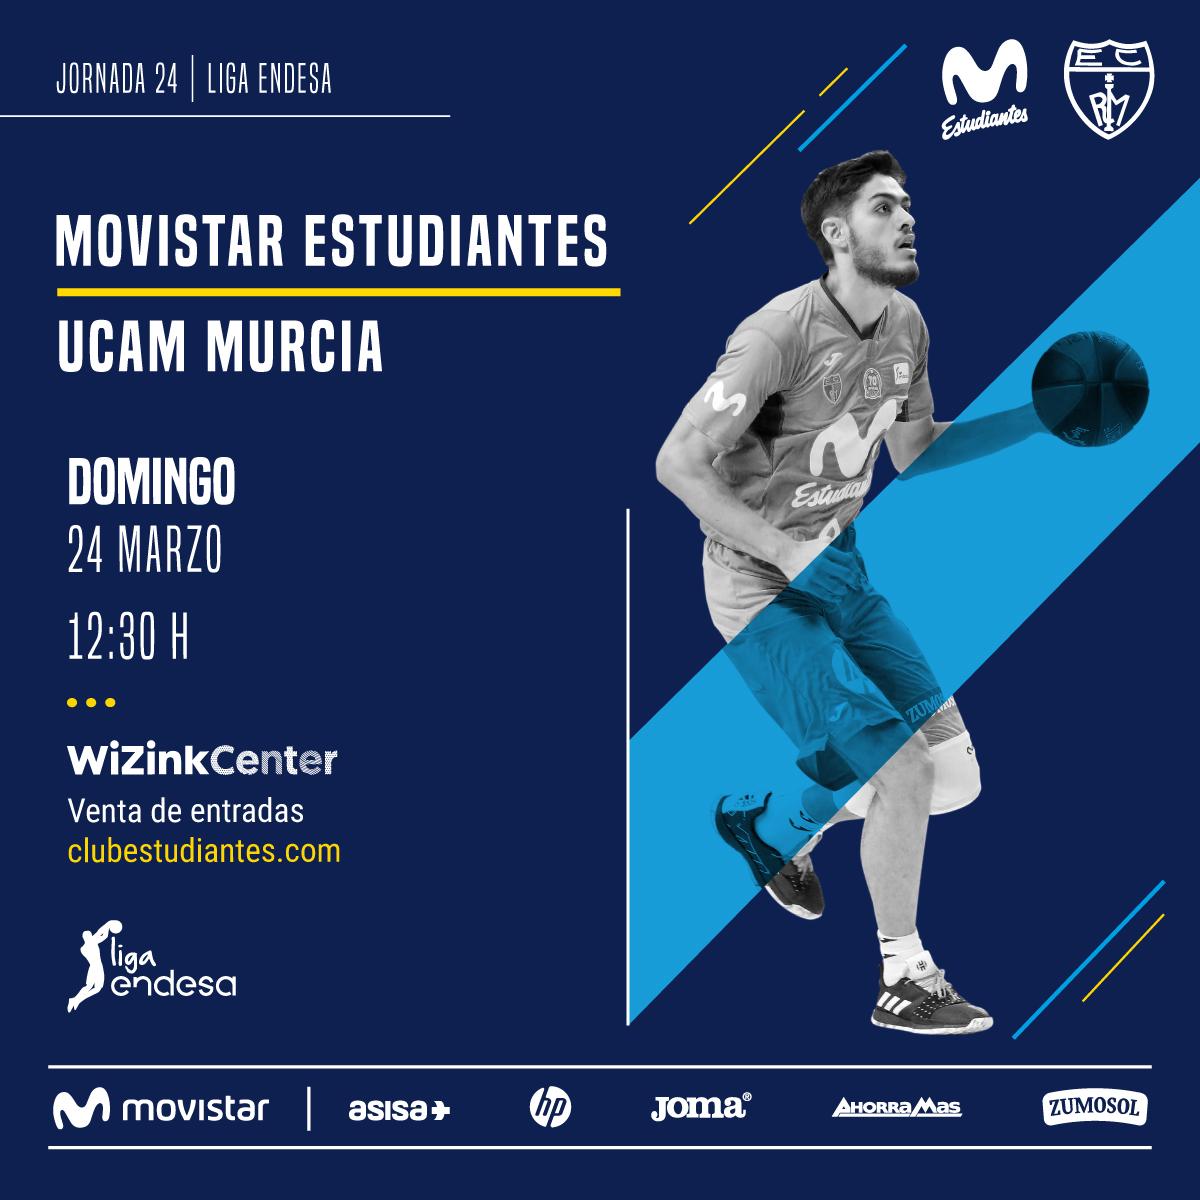 Movistar Estu – UCAM Murcia dom. 24, 12:30h